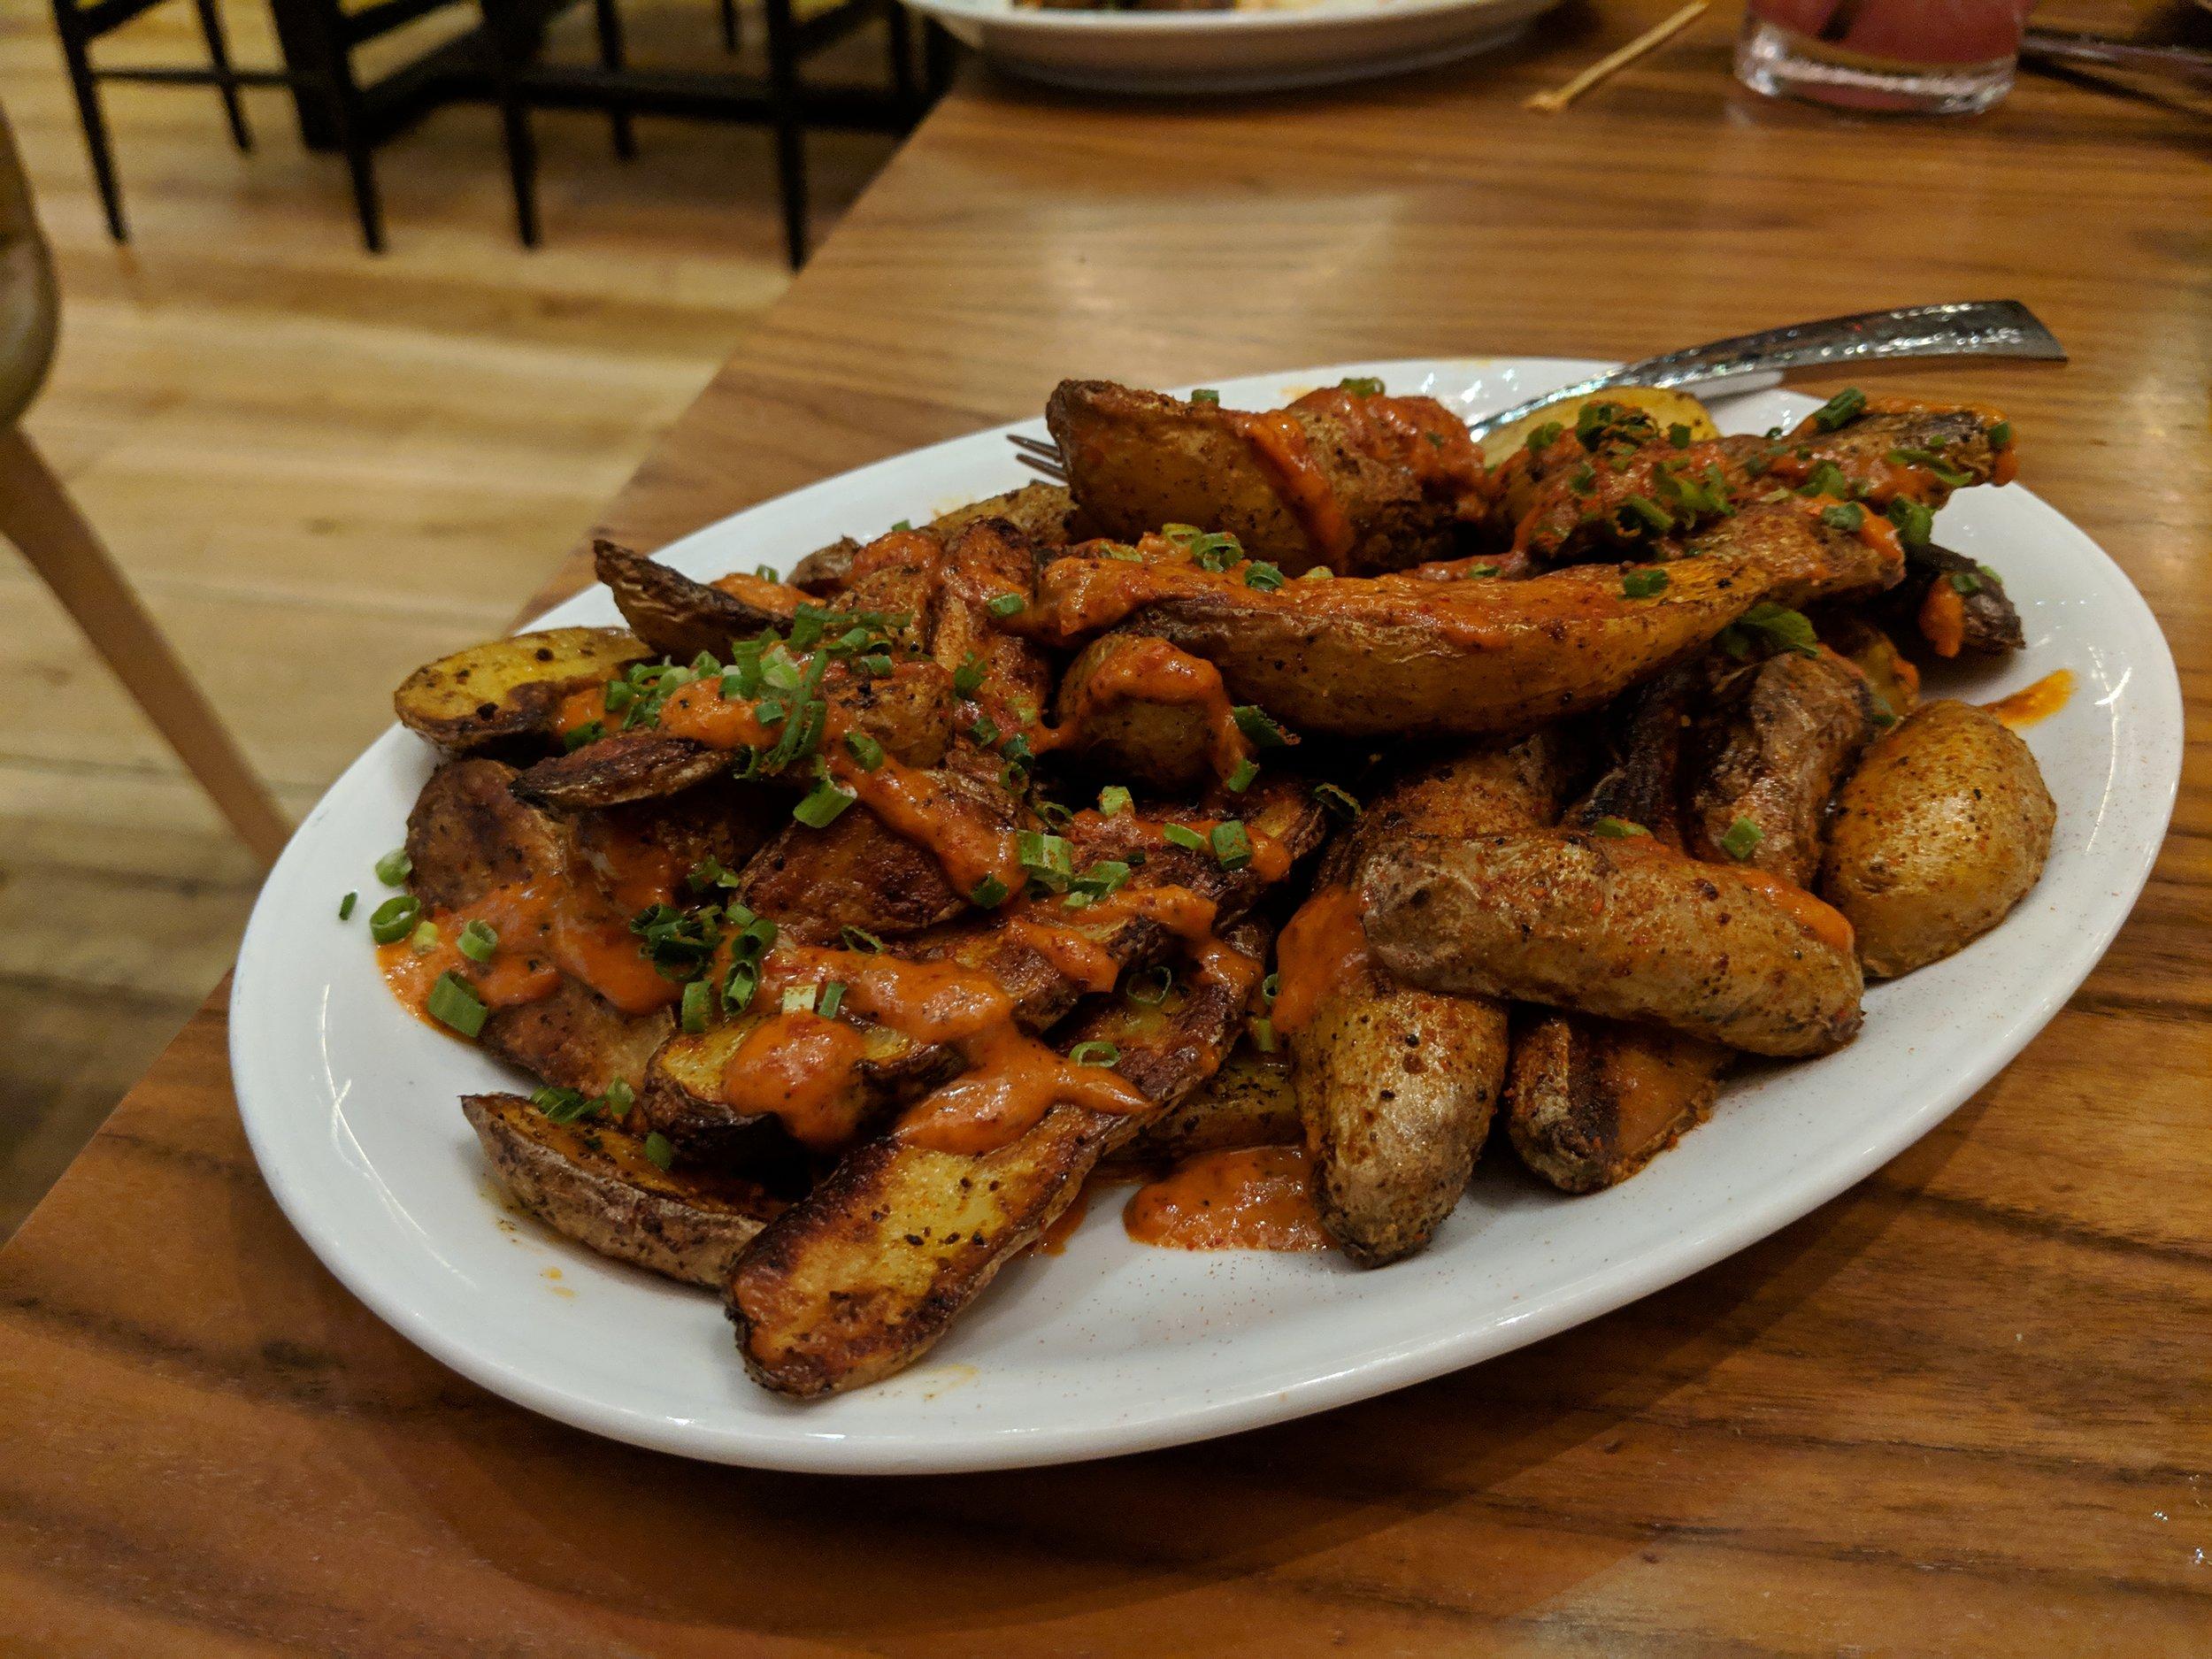 Patatas bravas (fingerling potatoes in a tomato-based sauce)